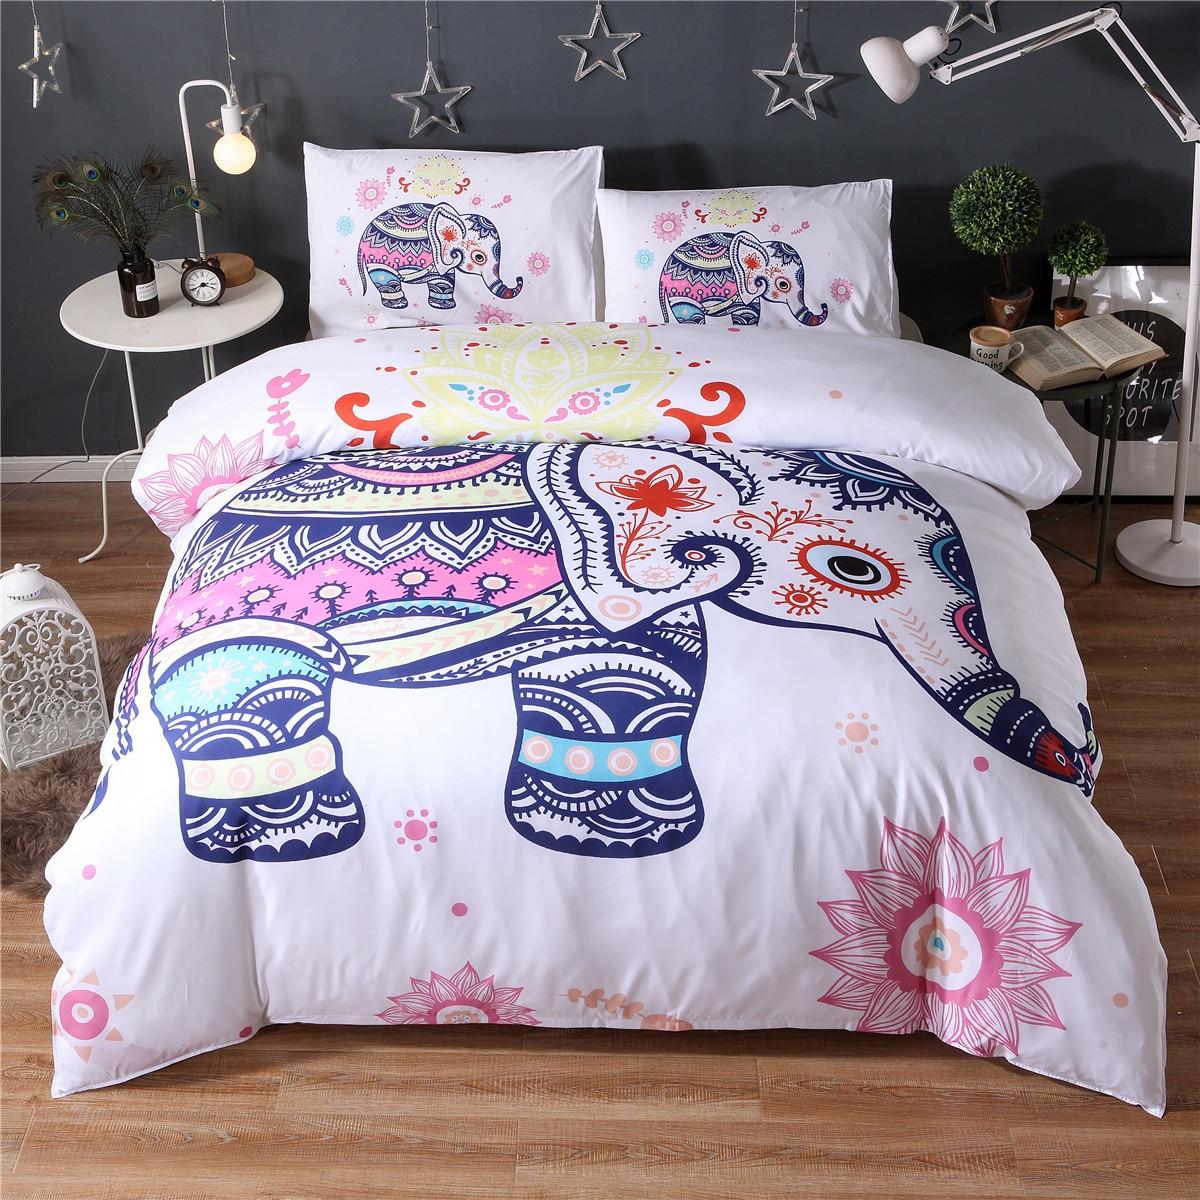 Indian Hippie Elephant Mandala Bedding Set King Size Bed Sheet /& 2 Pillow Cover